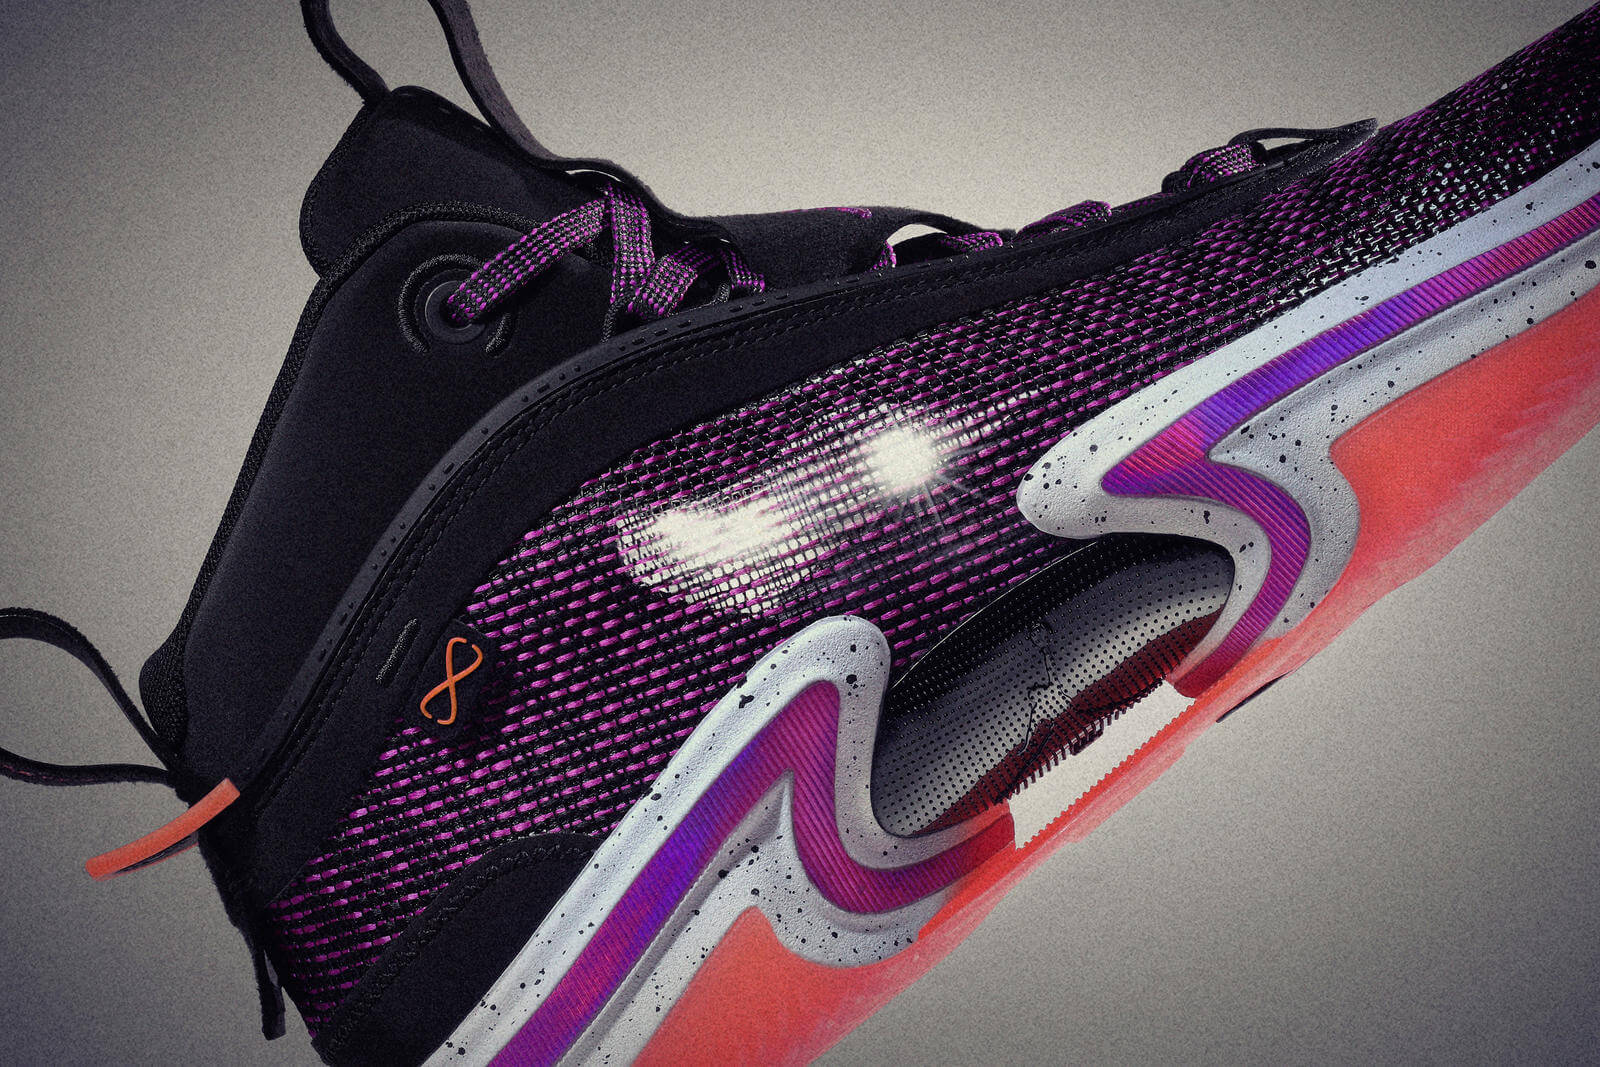 Nike Air Jordan XXXVI36 - First Light colorway feat. Leno-Weave Upper